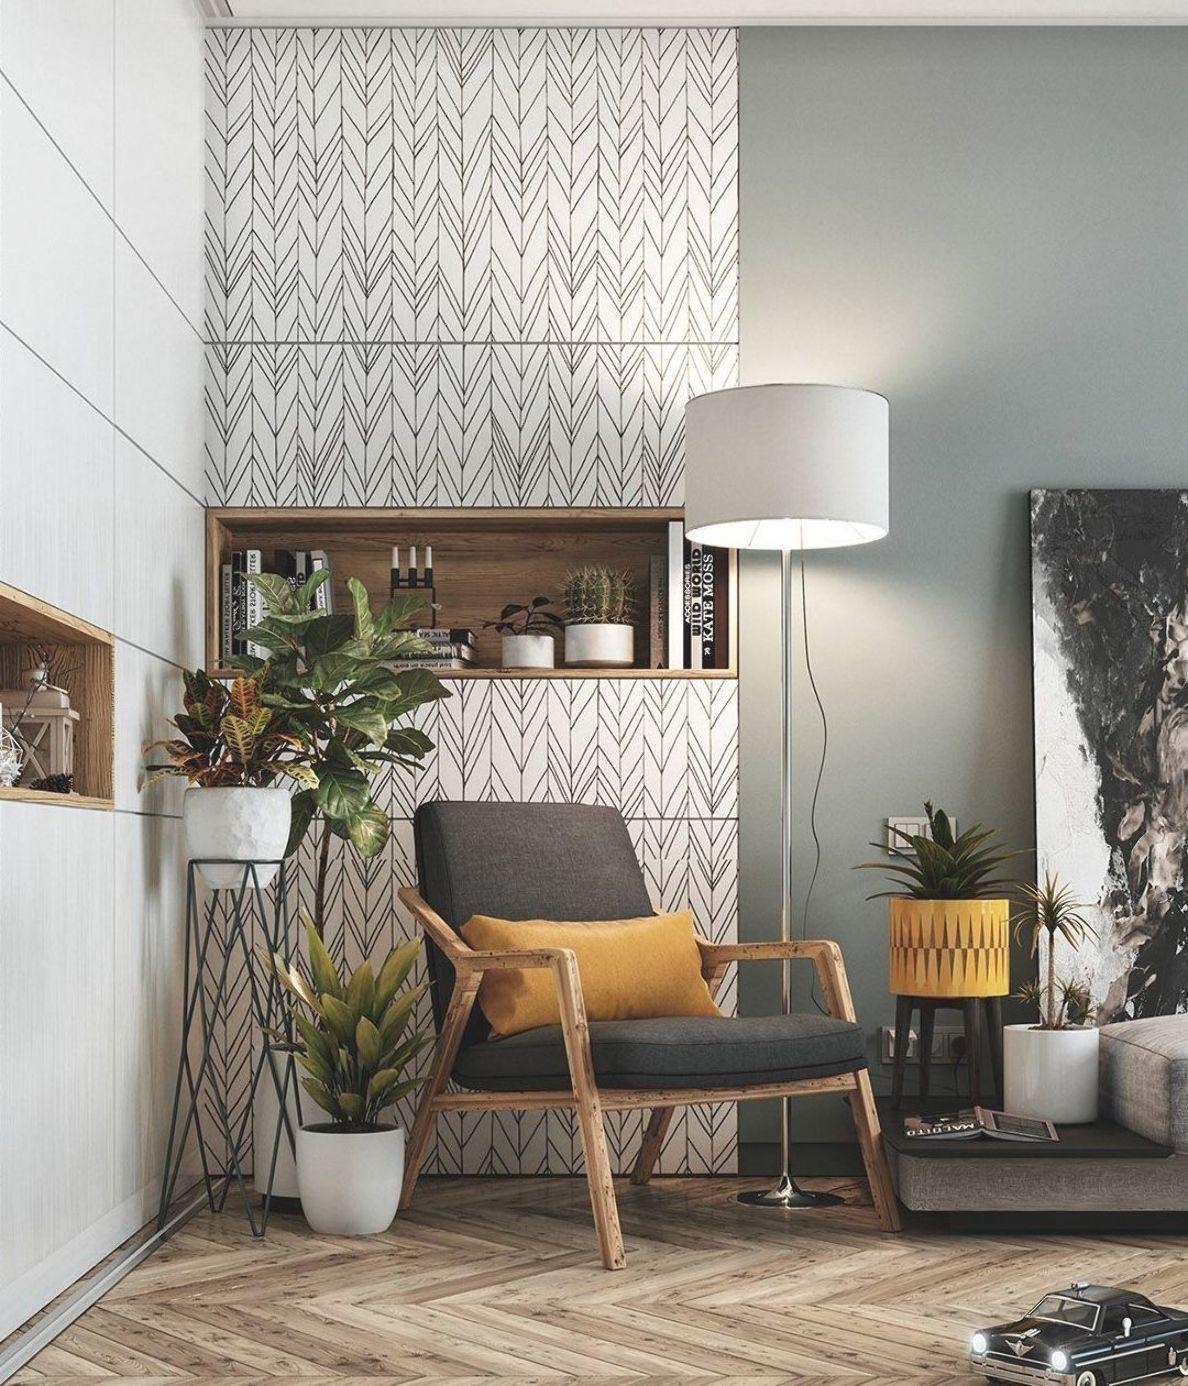 5 Fresh Funky Scandinavian Style Home Interiors The Style Of Scandinavia In 2020 Scandinavian Home Interiors Scandinavian Style Interior Scandinavian Interior Design